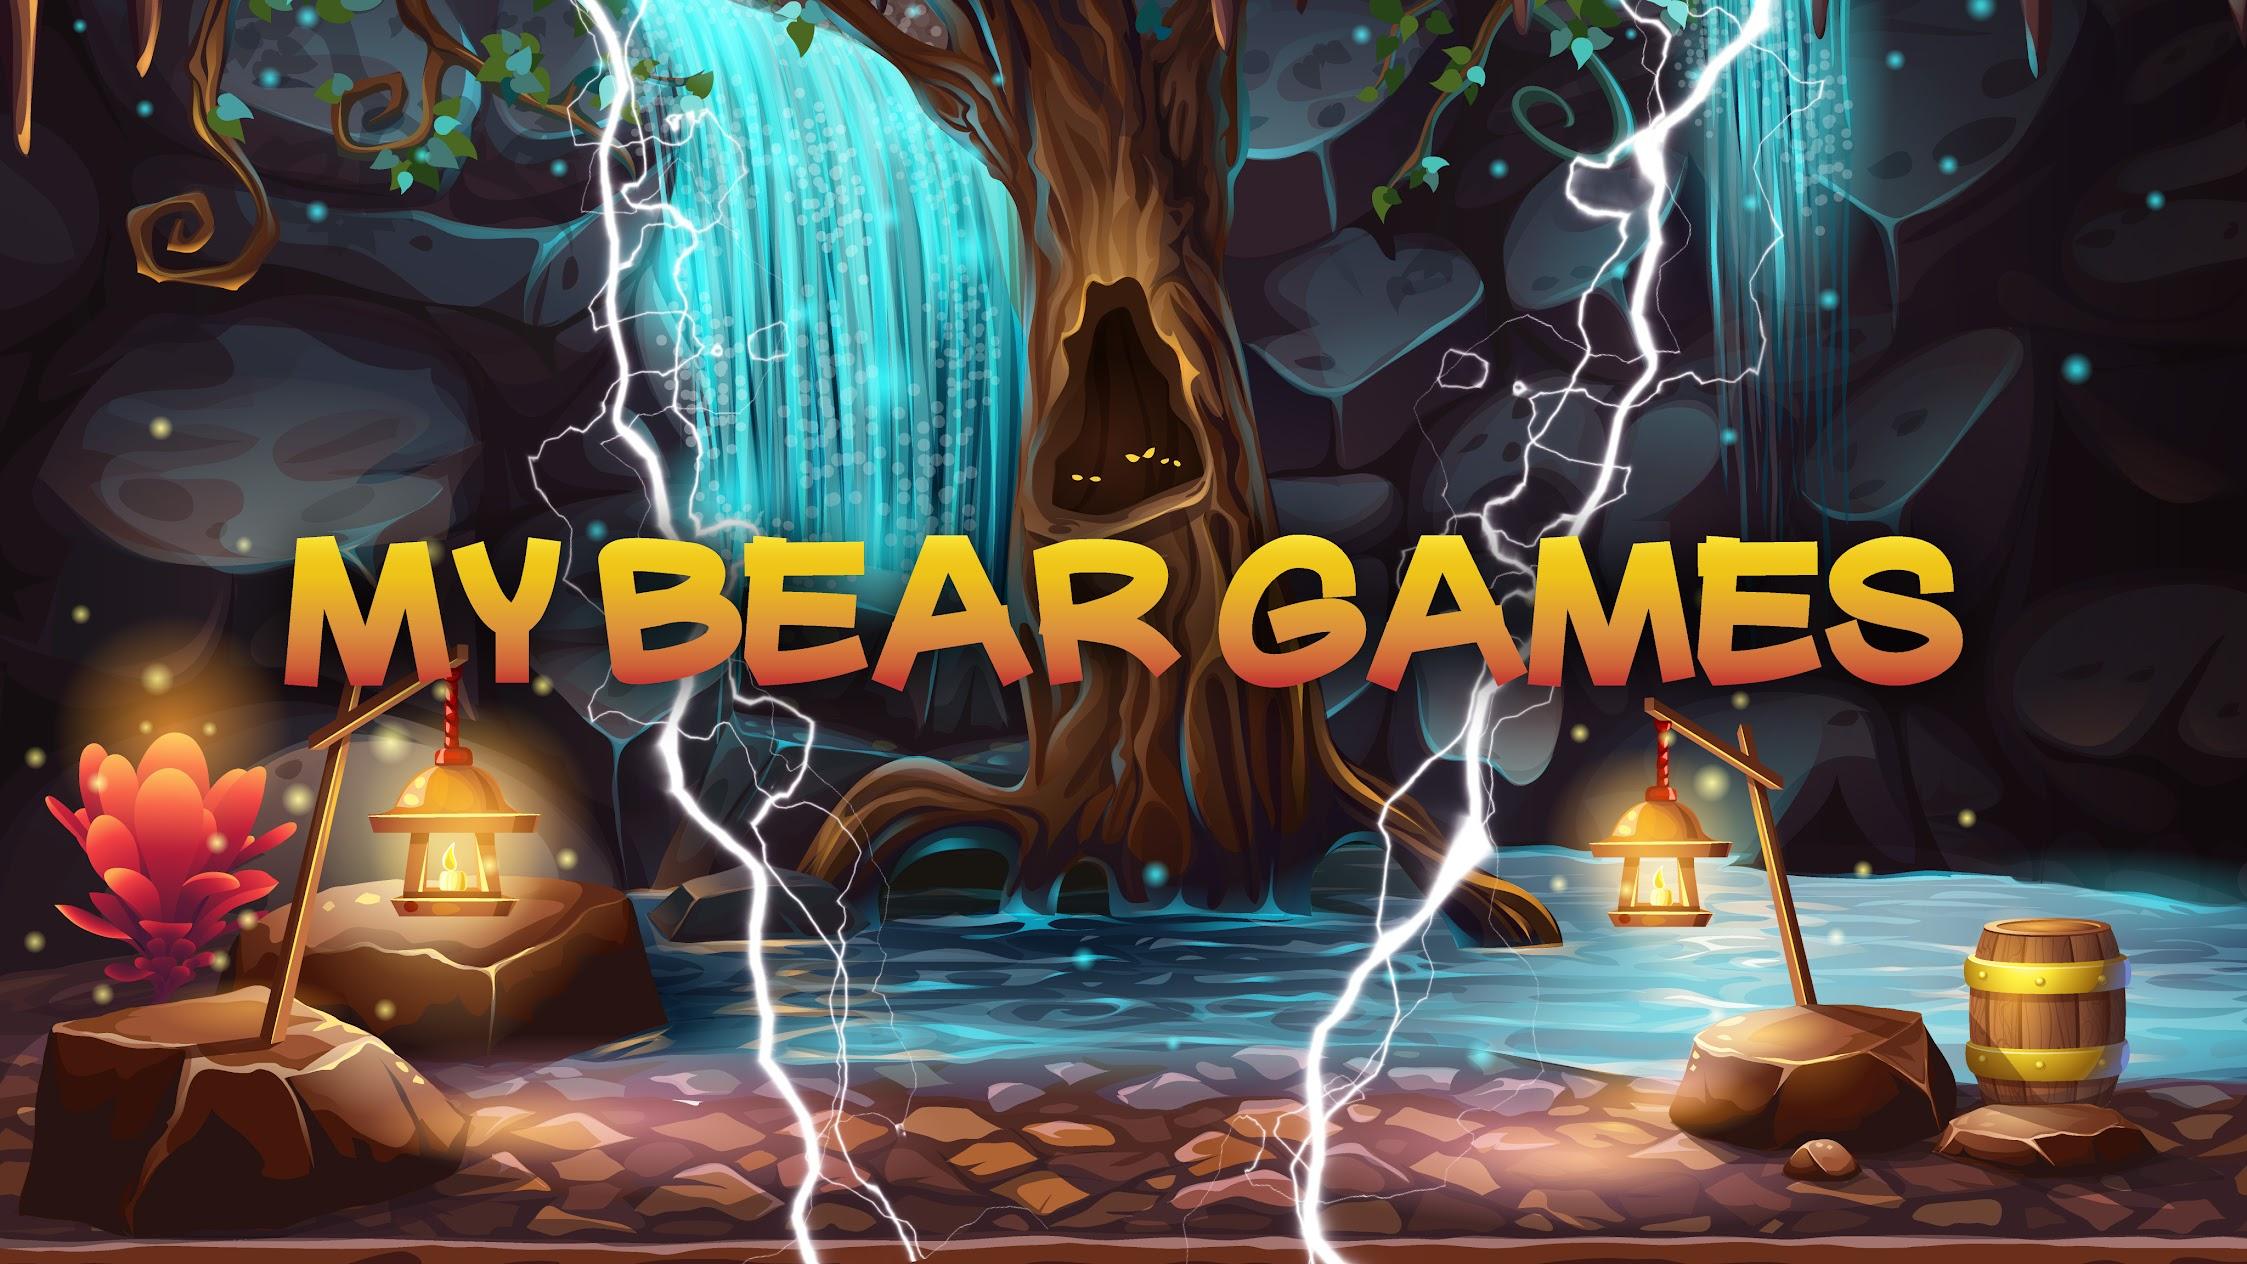 My Bear Games